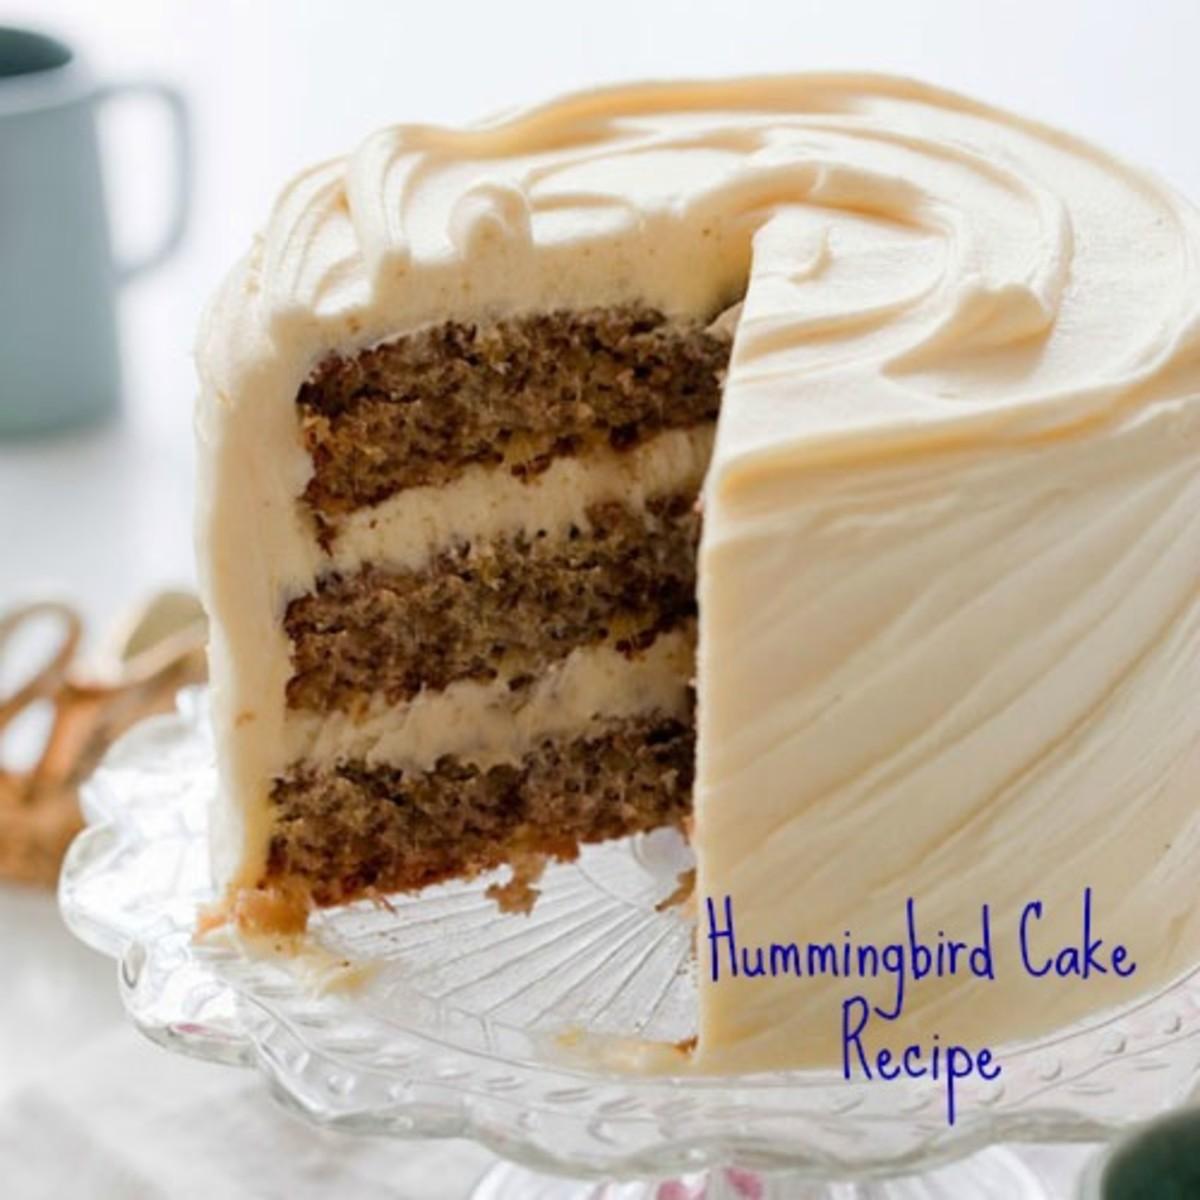 Hummingbird Cake Recipe - a Favorite Southern Dessert